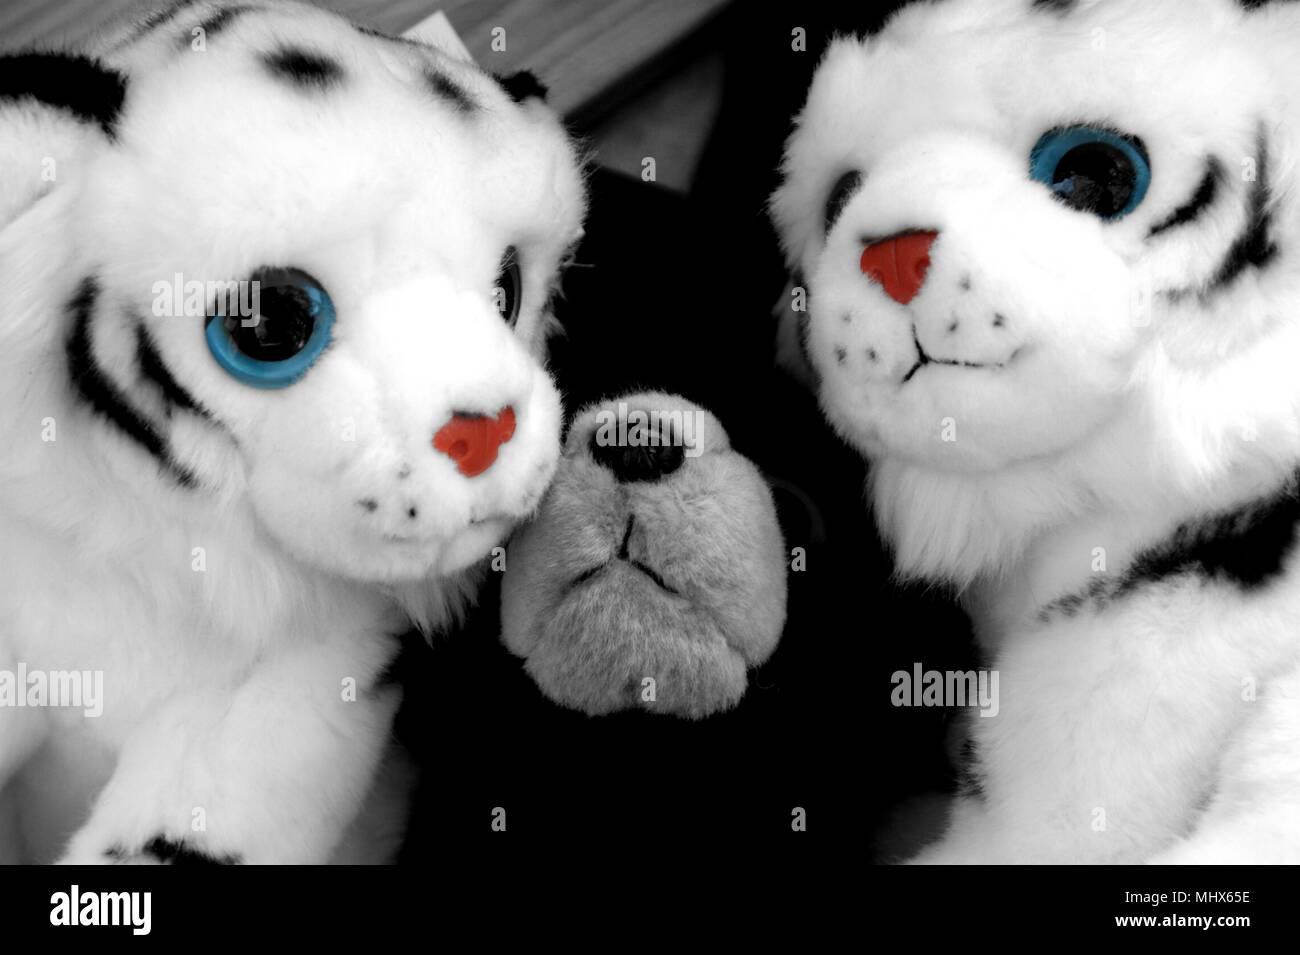 Pandas Juguete Abrazos Oso De Juguete Foto Imagen De Stock